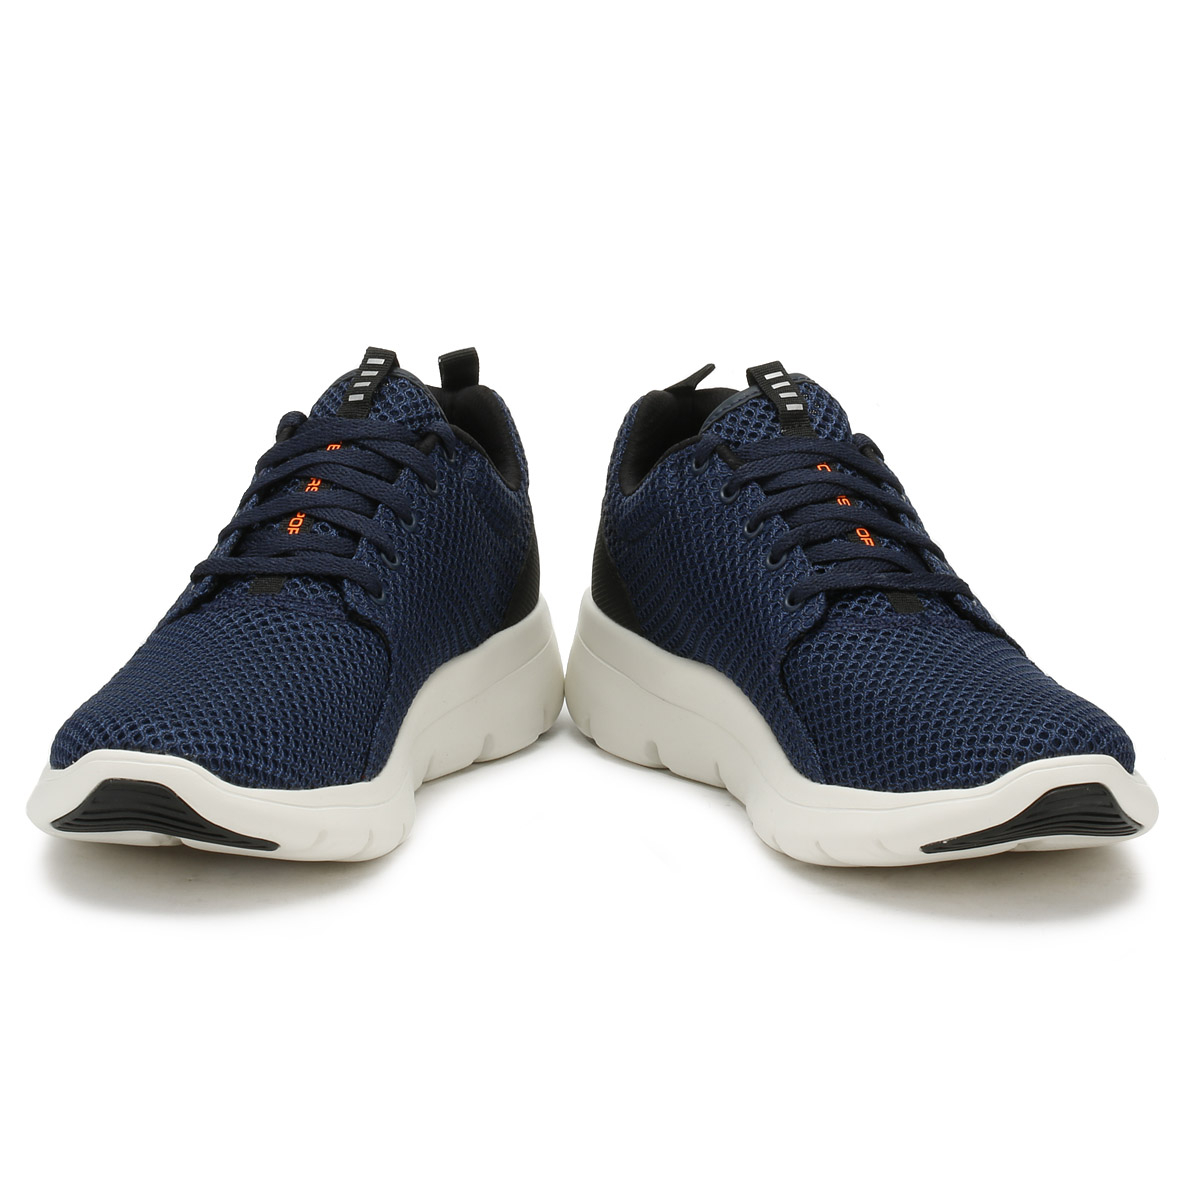 Skechers  Uomo Navy Navy Navy Blau Marauder Trainers Sport Casual Running Schuhes 784a33